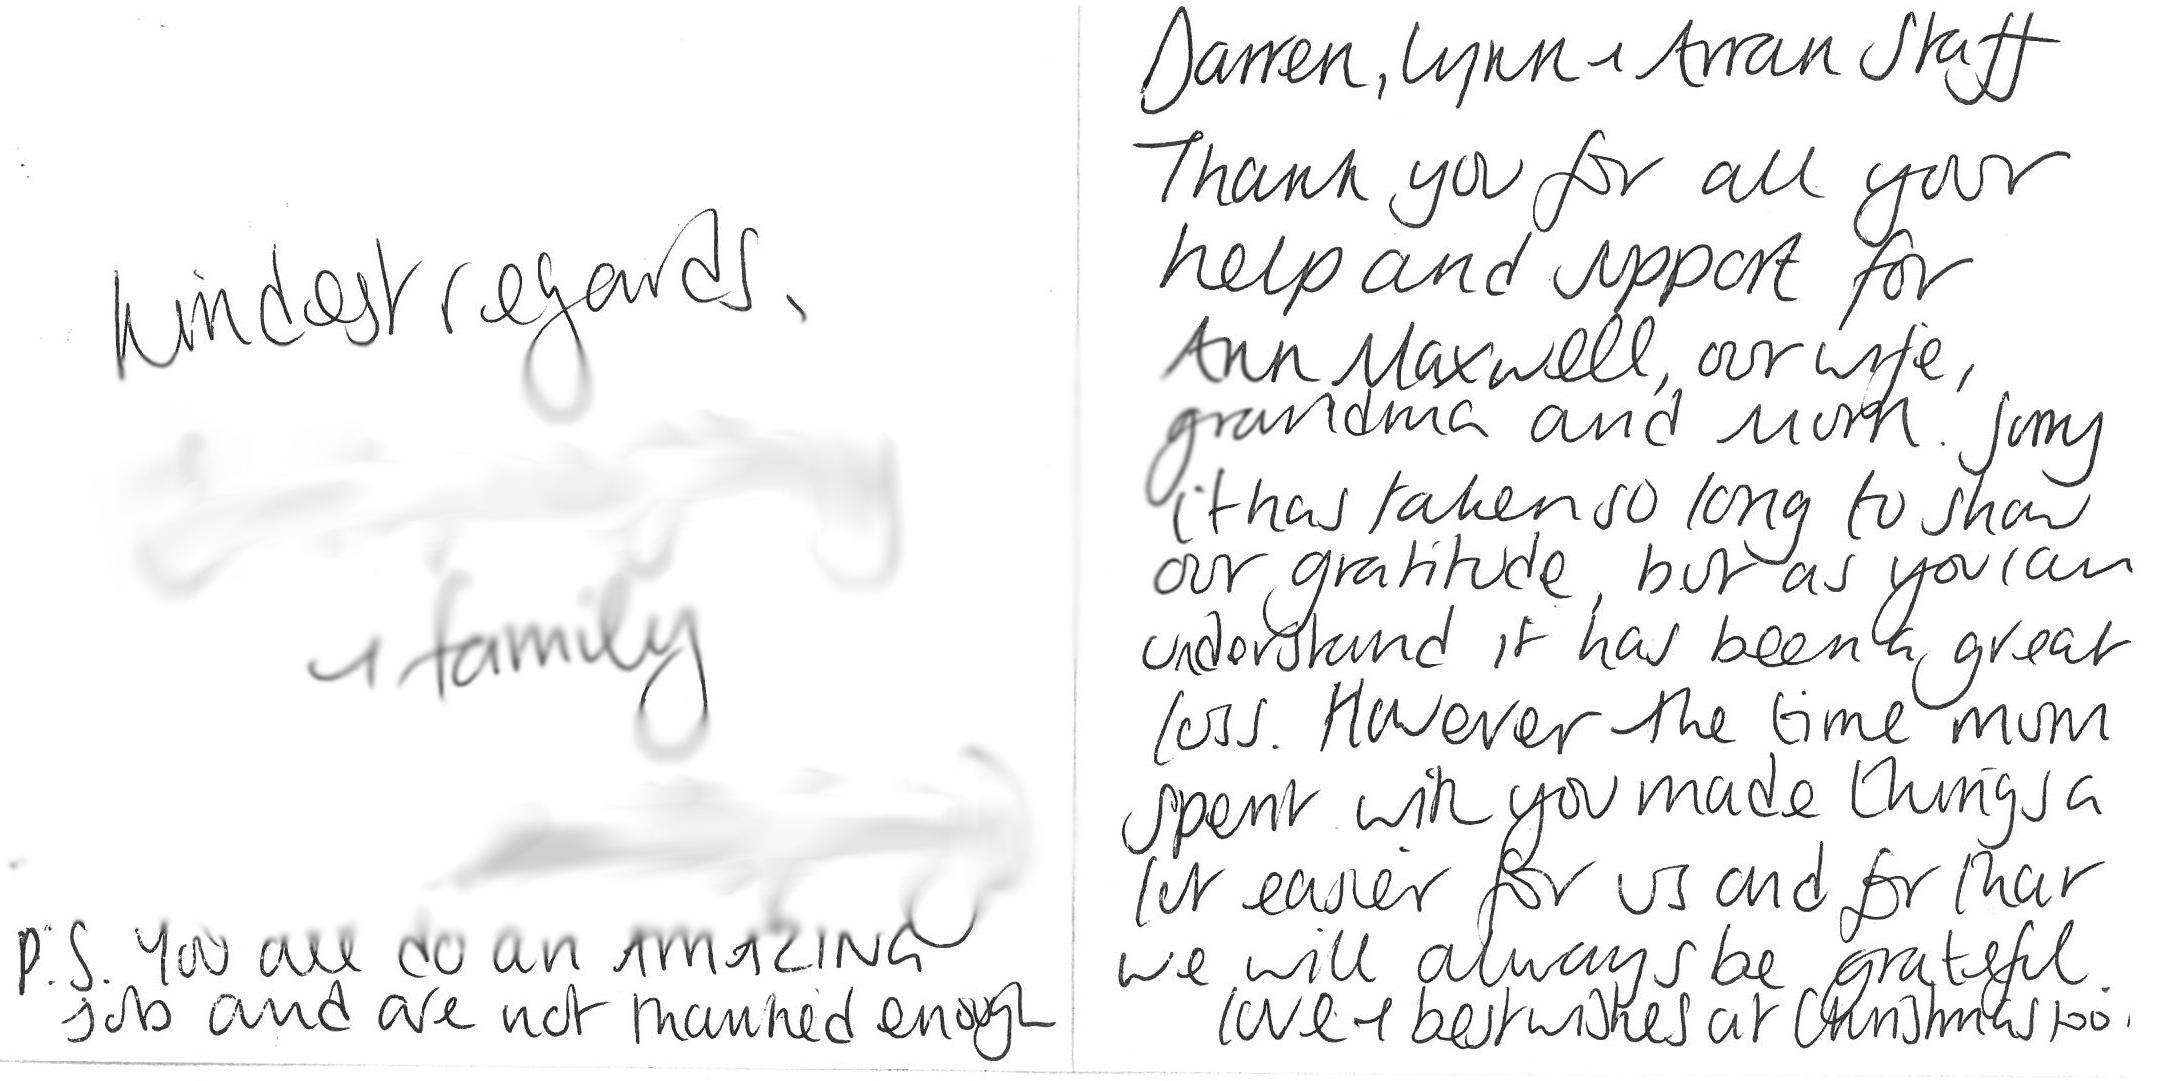 Thankyou Letter (Dec 19 4)